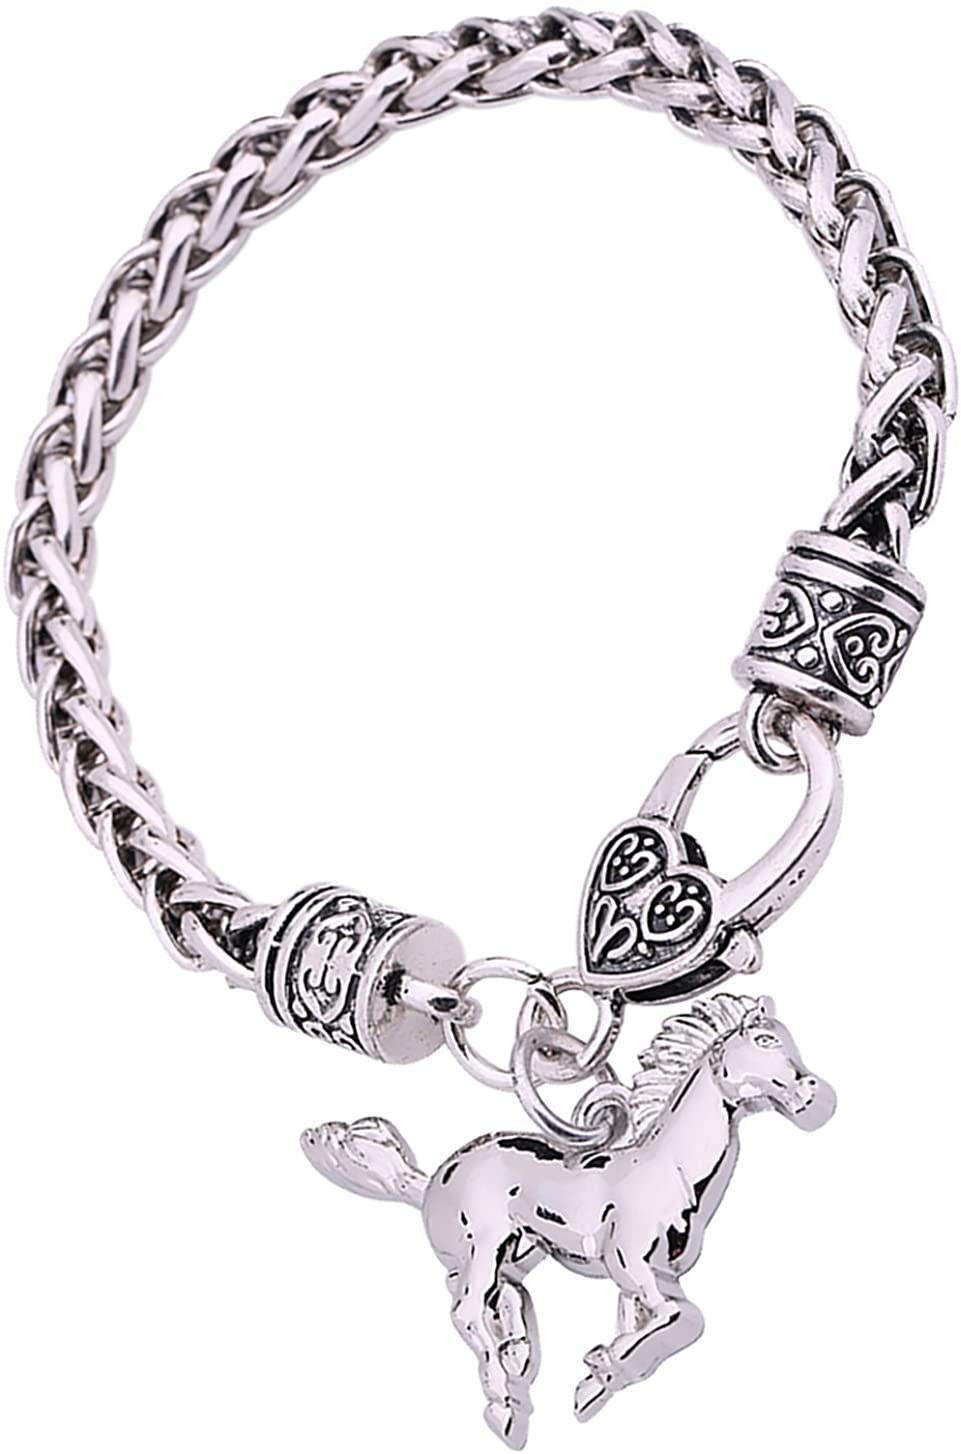 Lemegeton Antique Silver Heart Bracelet Character Engraved Pendant Wheat Chain for Women Girls Gift Jewelry